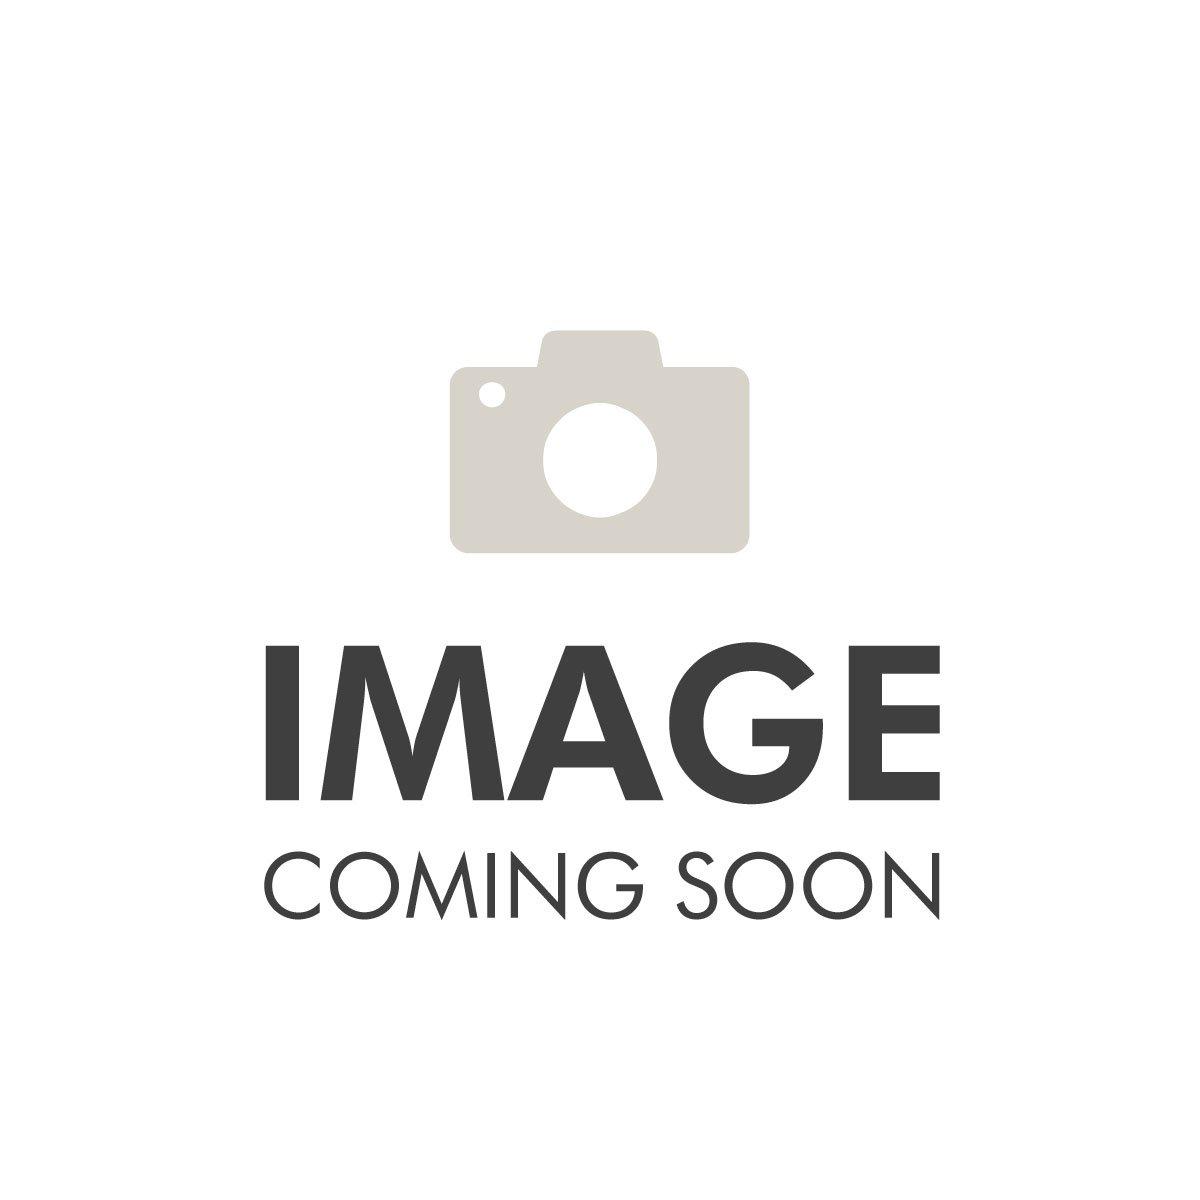 Thierry Mugler Angel 25ml EDP Spray / 100ml Perfuming Body Lotion / Purse